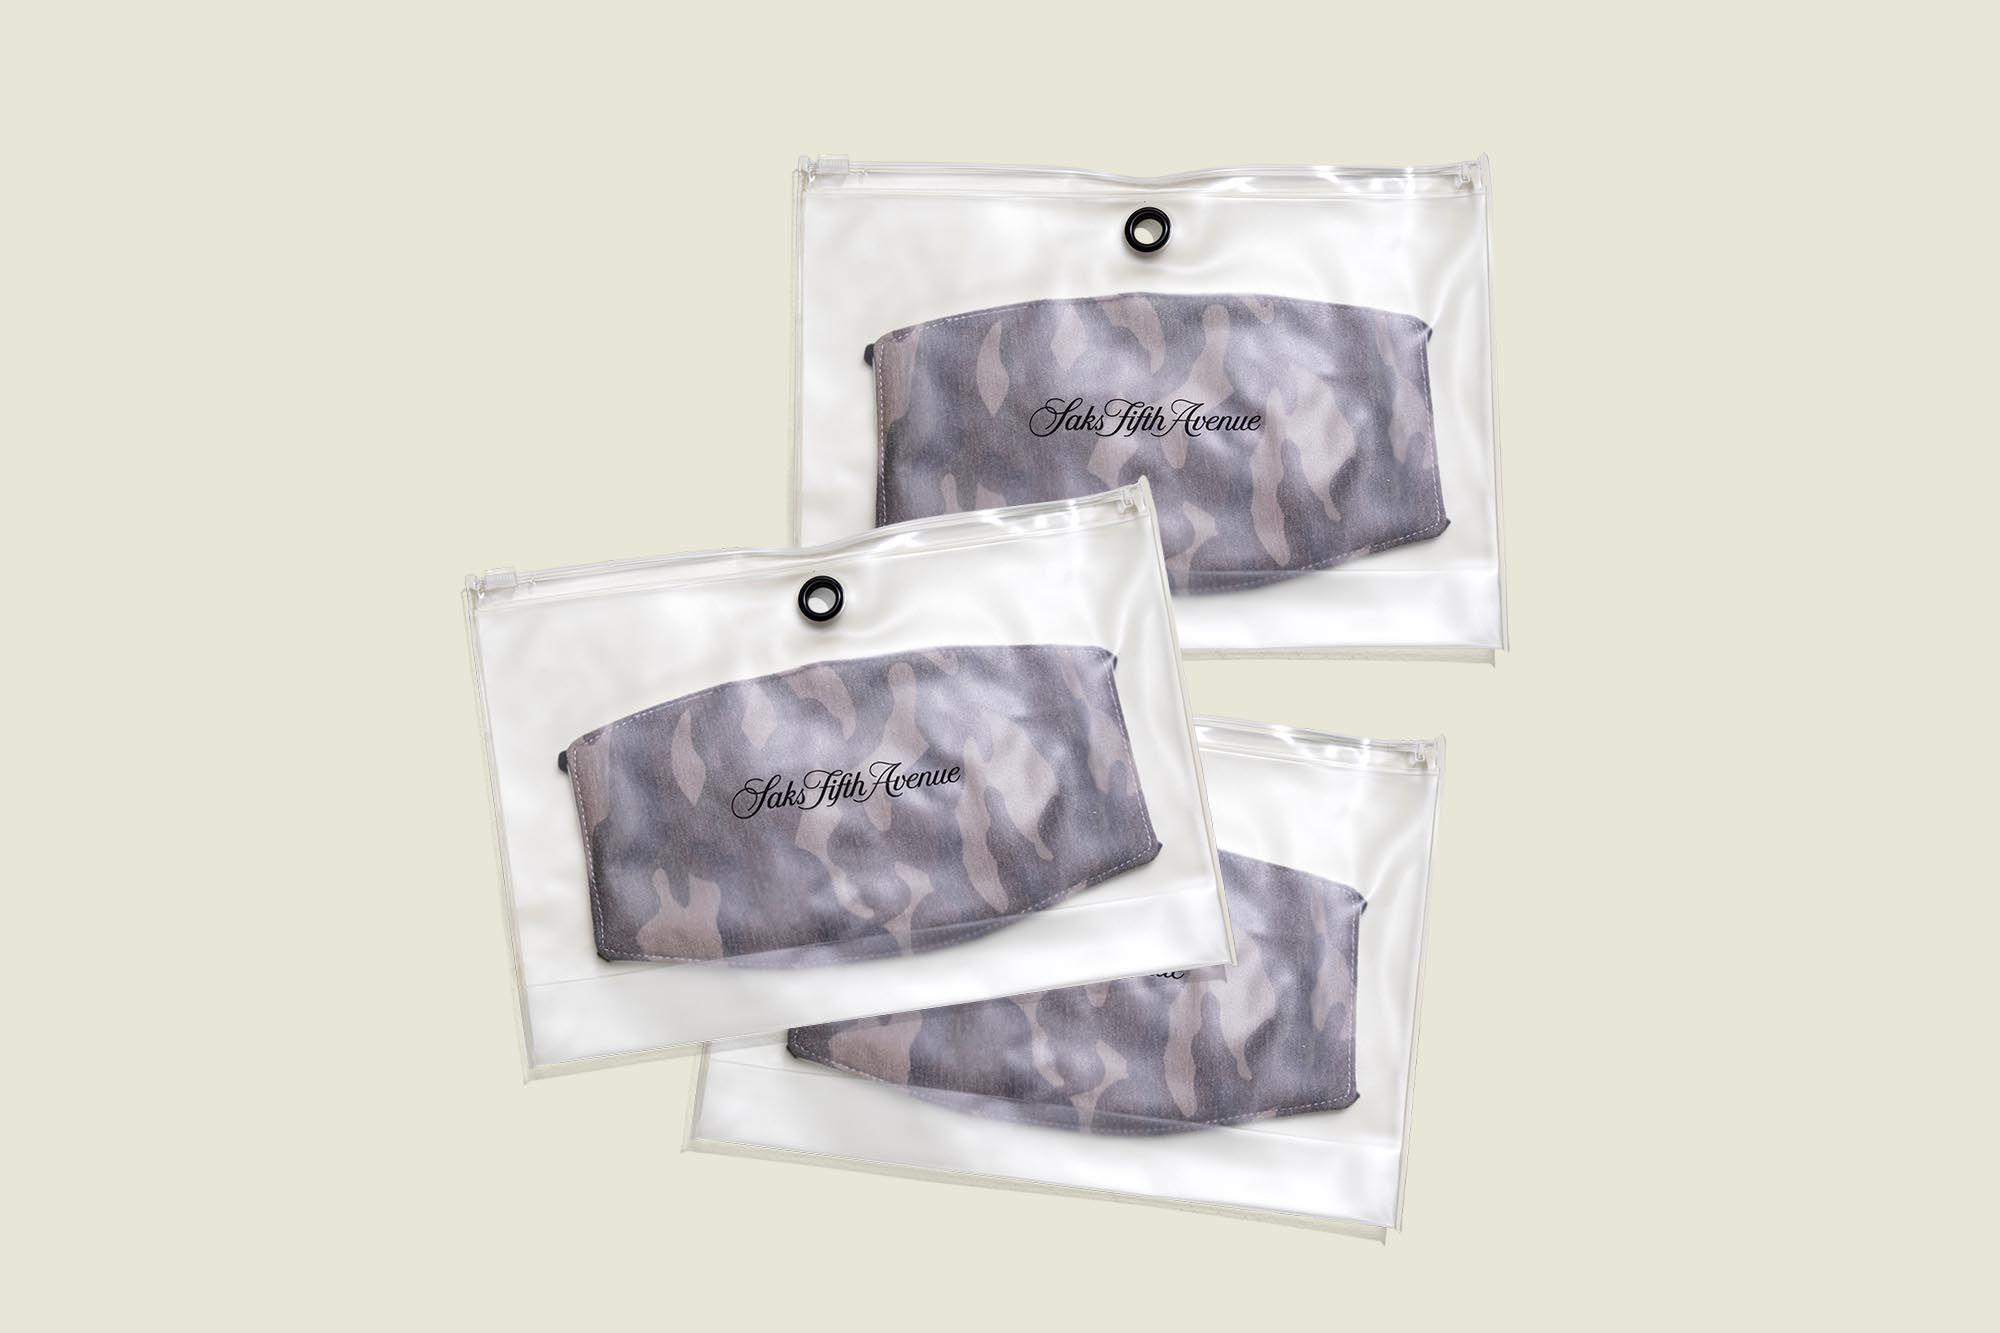 Face mask packaged in ziplock bag